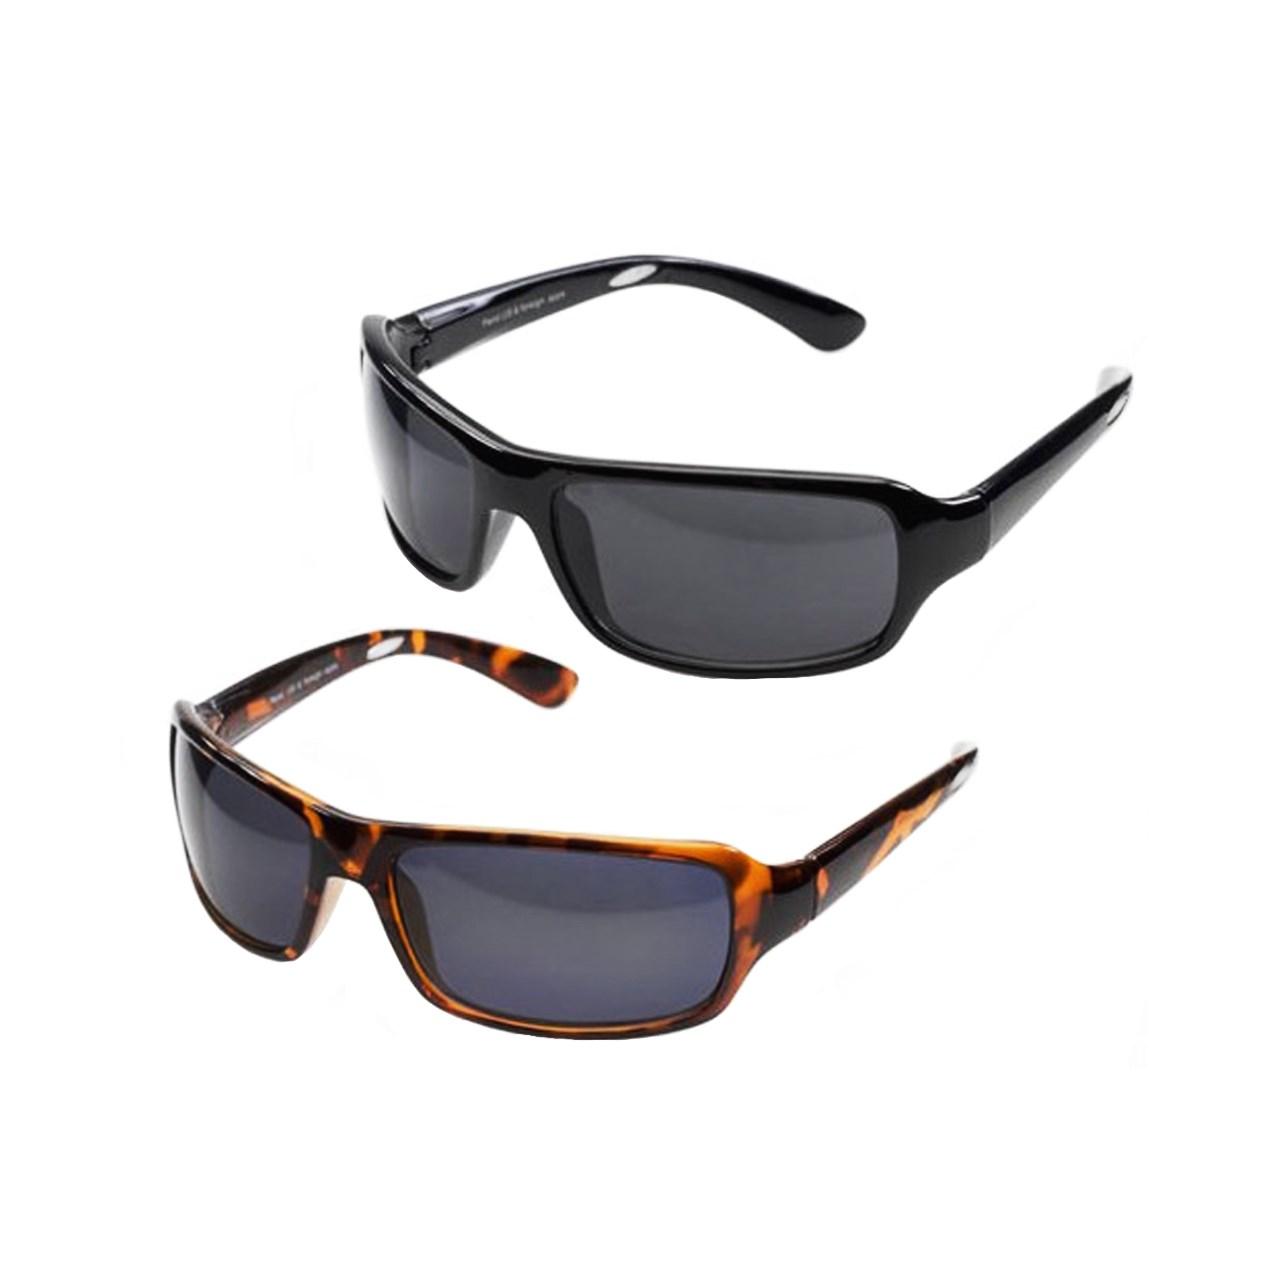 عکس عینک آفتابی مدل Trucolor بسته 2 عددی